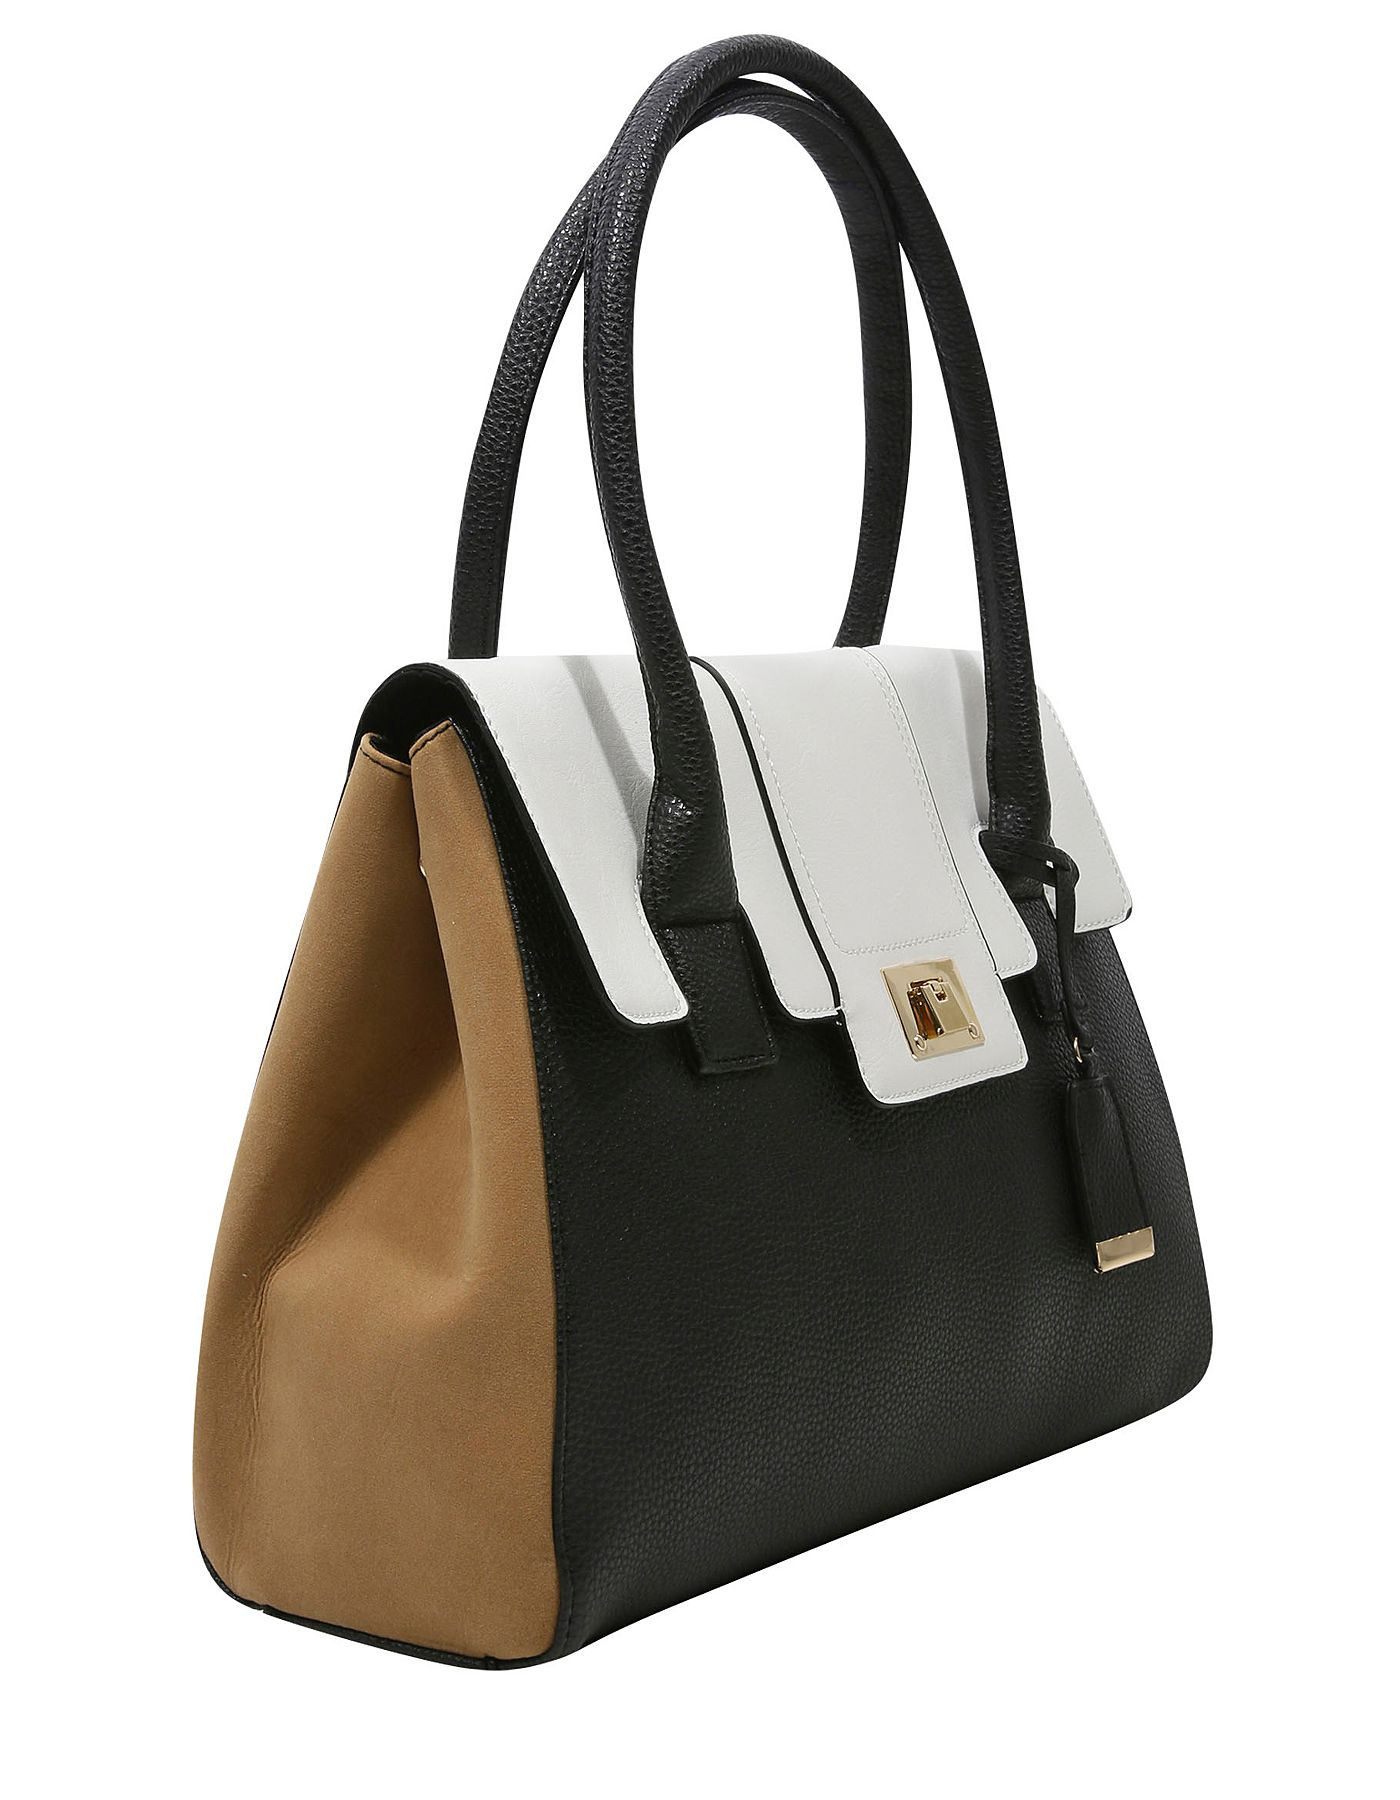 Fashion Tote Bag | Women | George at ASDA | Fashion tote bag